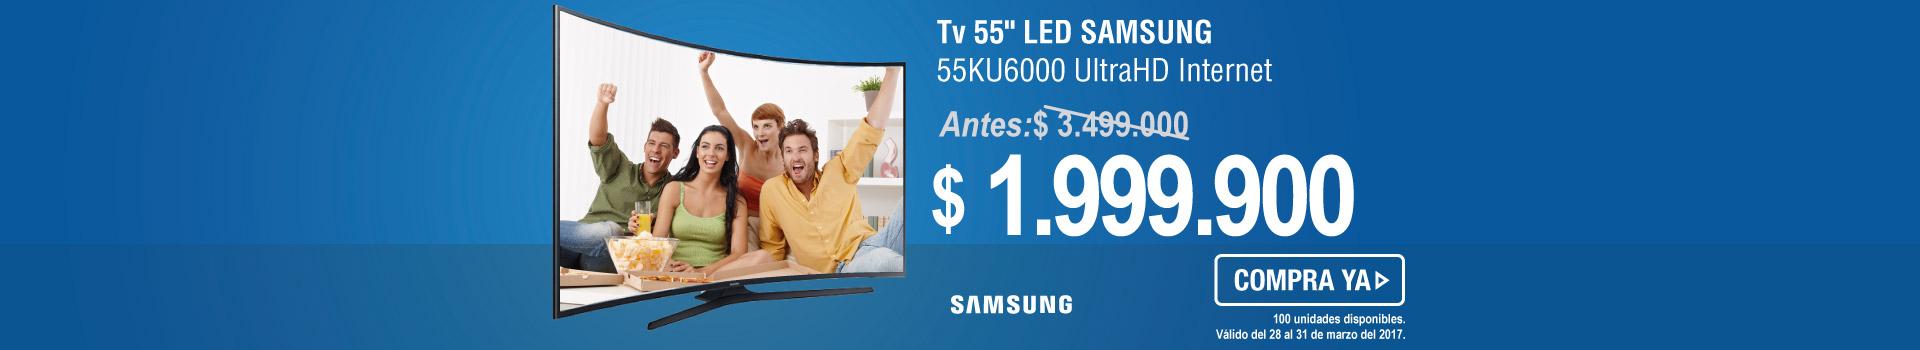 TV 49 124cm LED SAMSUNG 49KU6300 UHD - banner principal